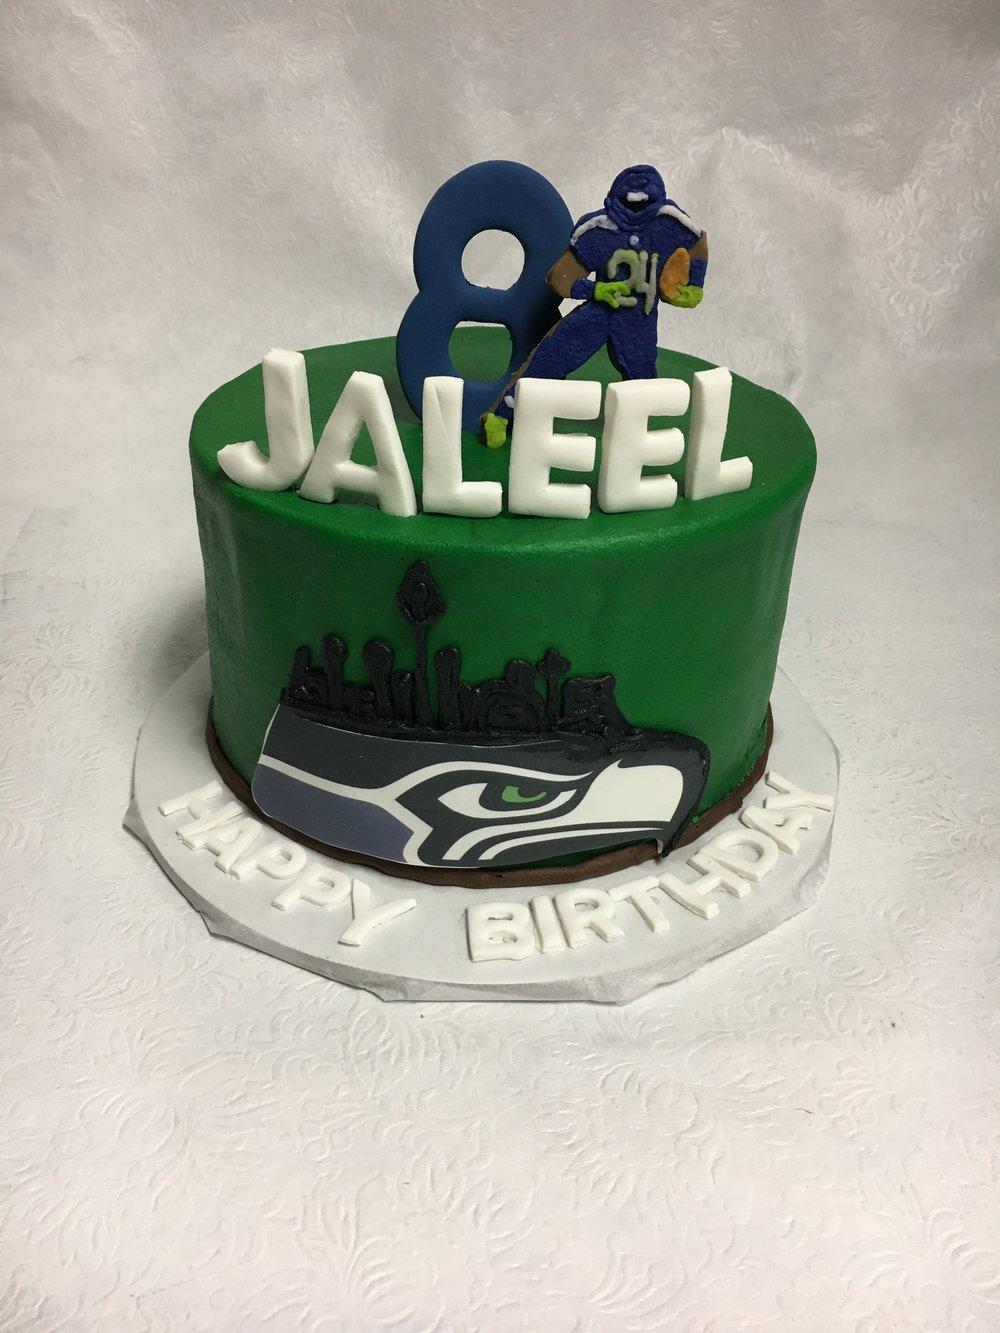 seahawks football birthday cake.jpg